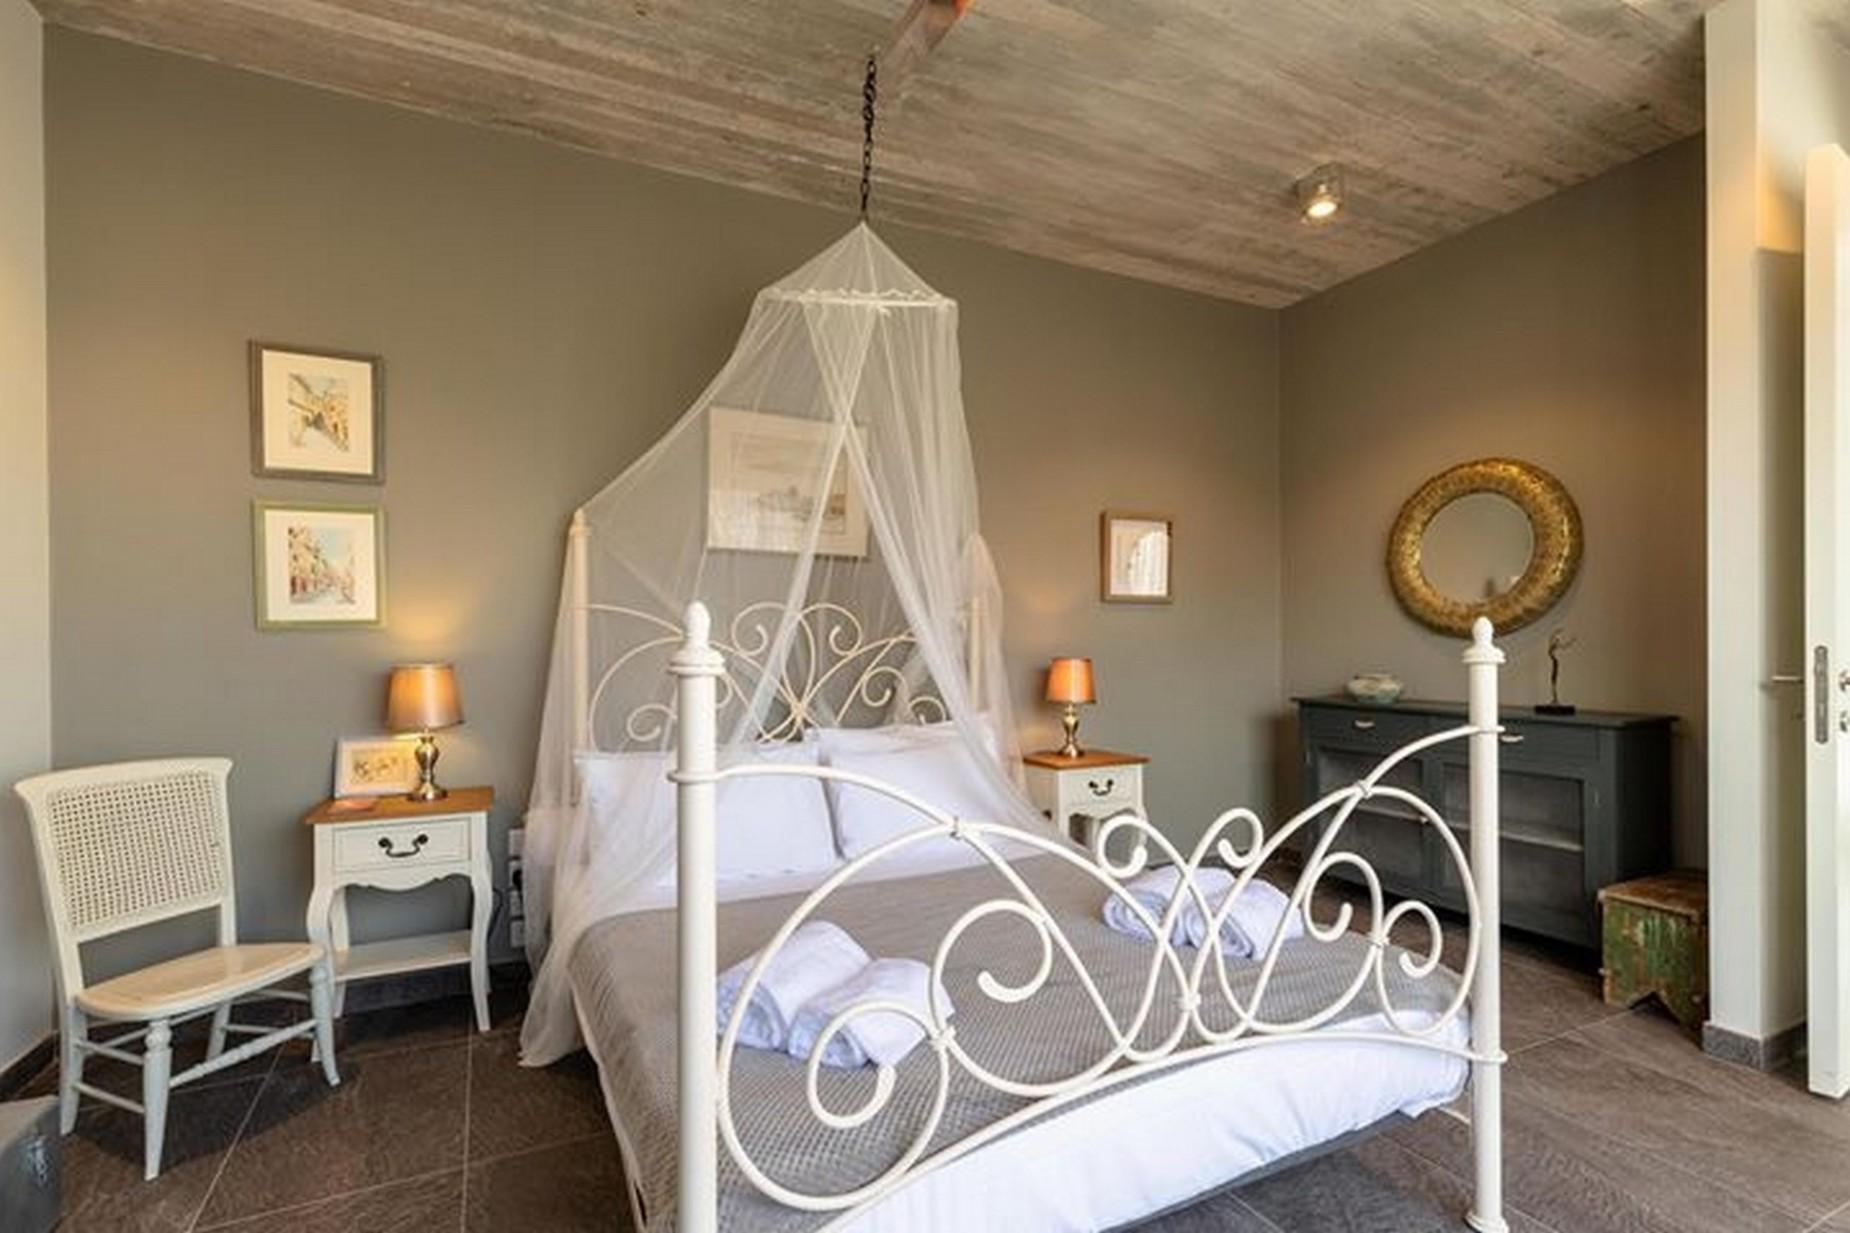 5 bed Villa For Rent in Gharghur, Gharghur - thumb 6